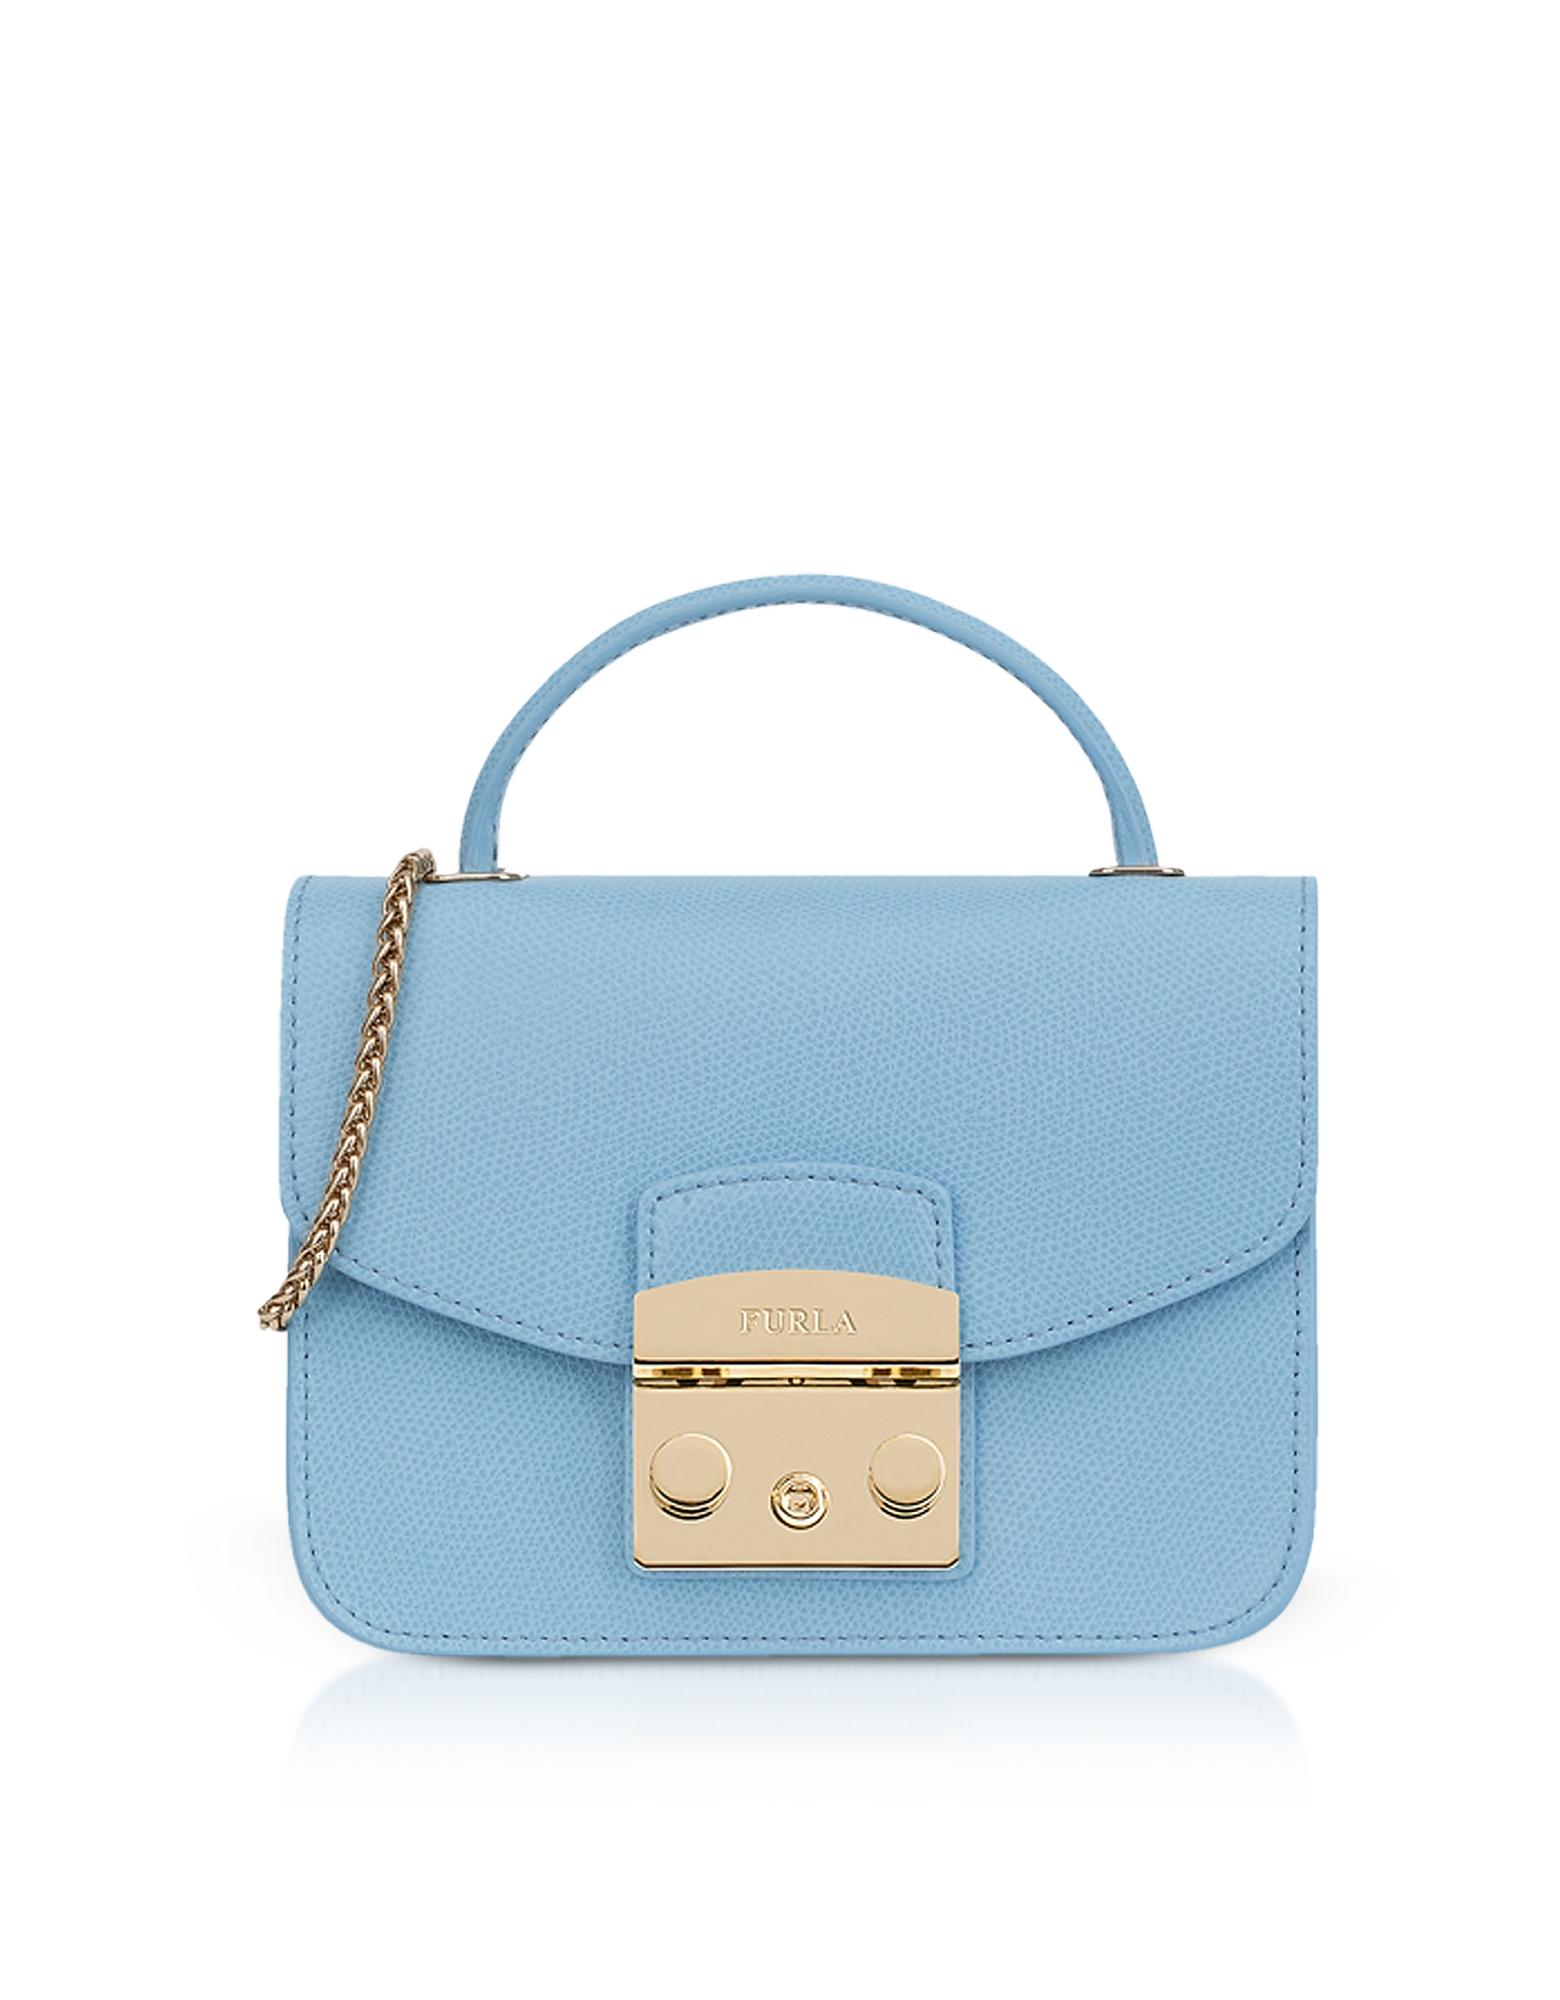 Furla Handbags, Metropolis Mini Top Handle Crossbody Bag